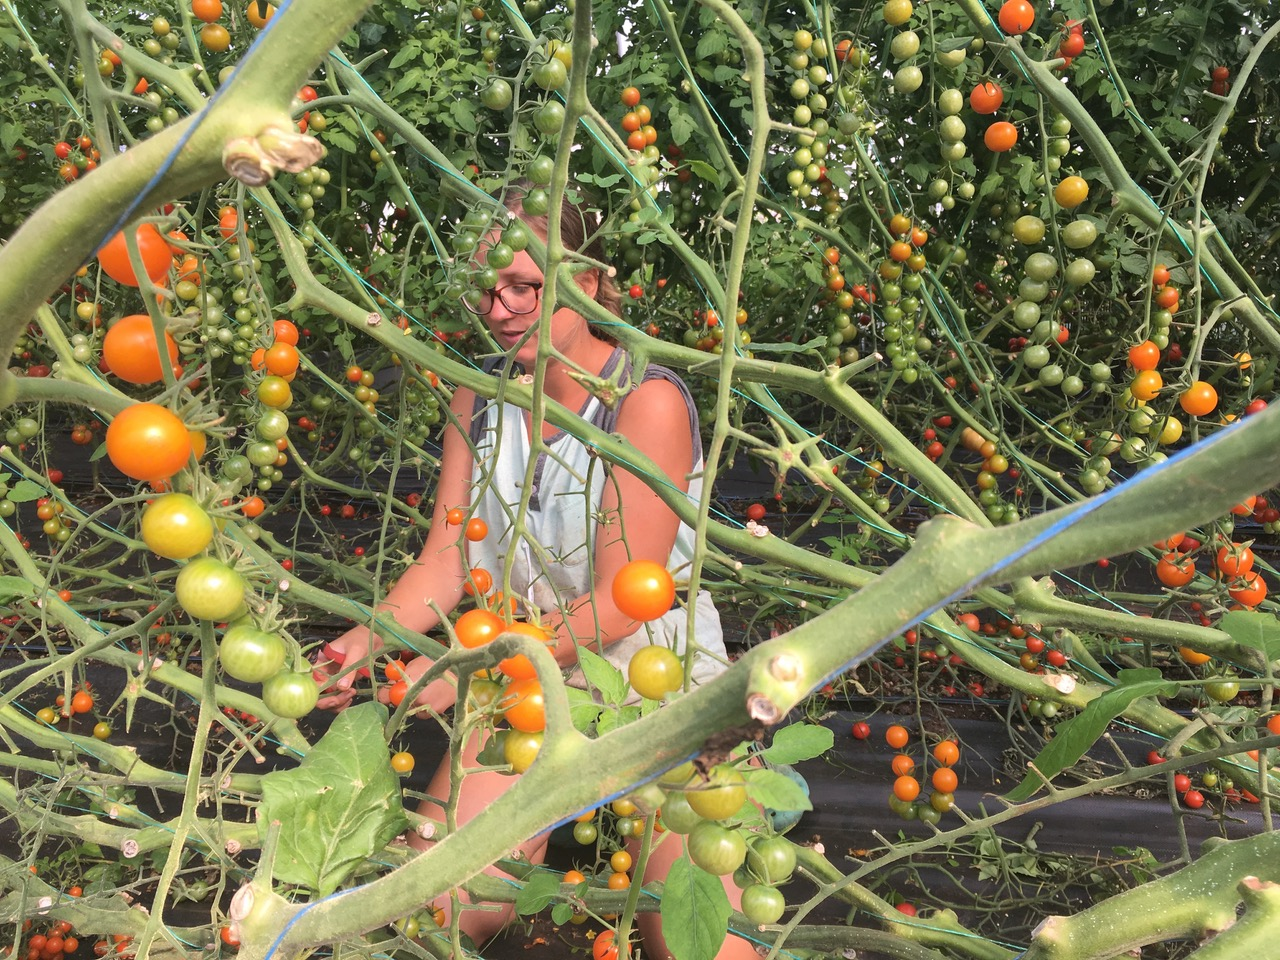 rhitomatoes